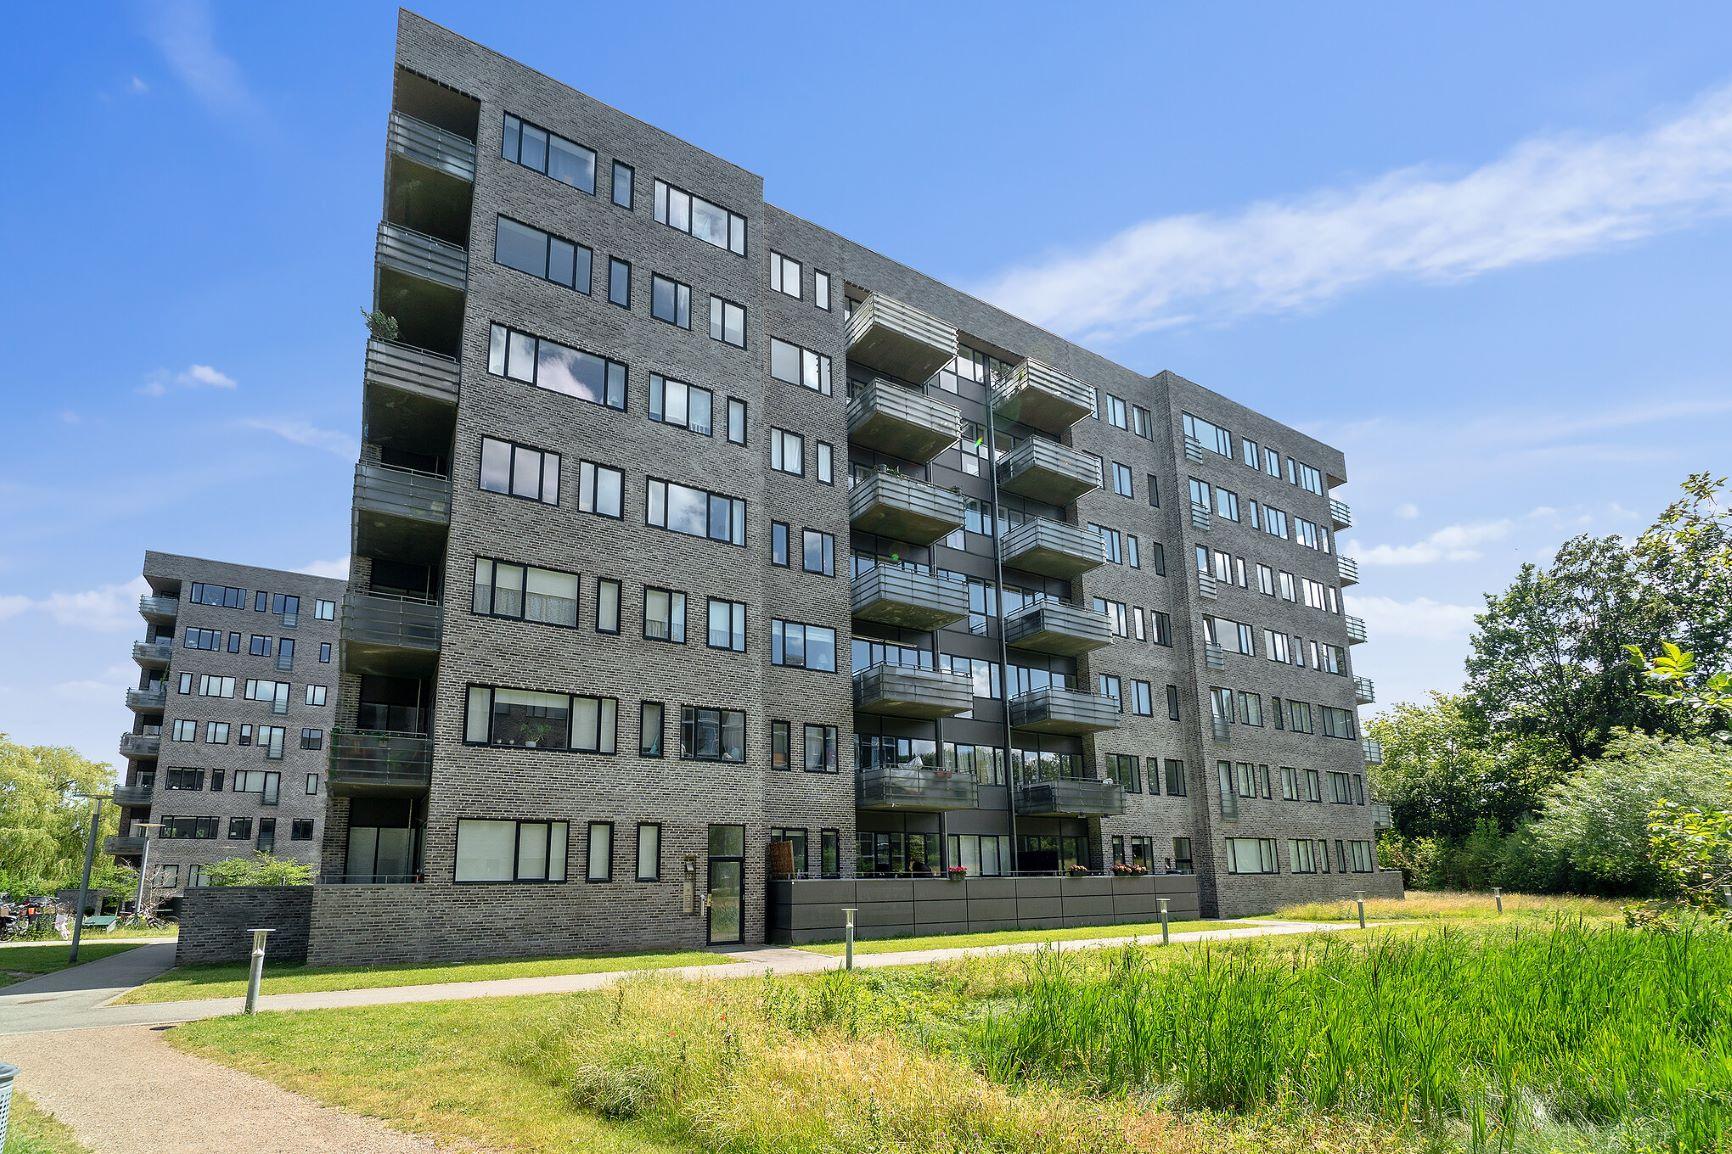 Lejebolig på Gyngemose Parkvej 24, 3. th., 2860 Søborg